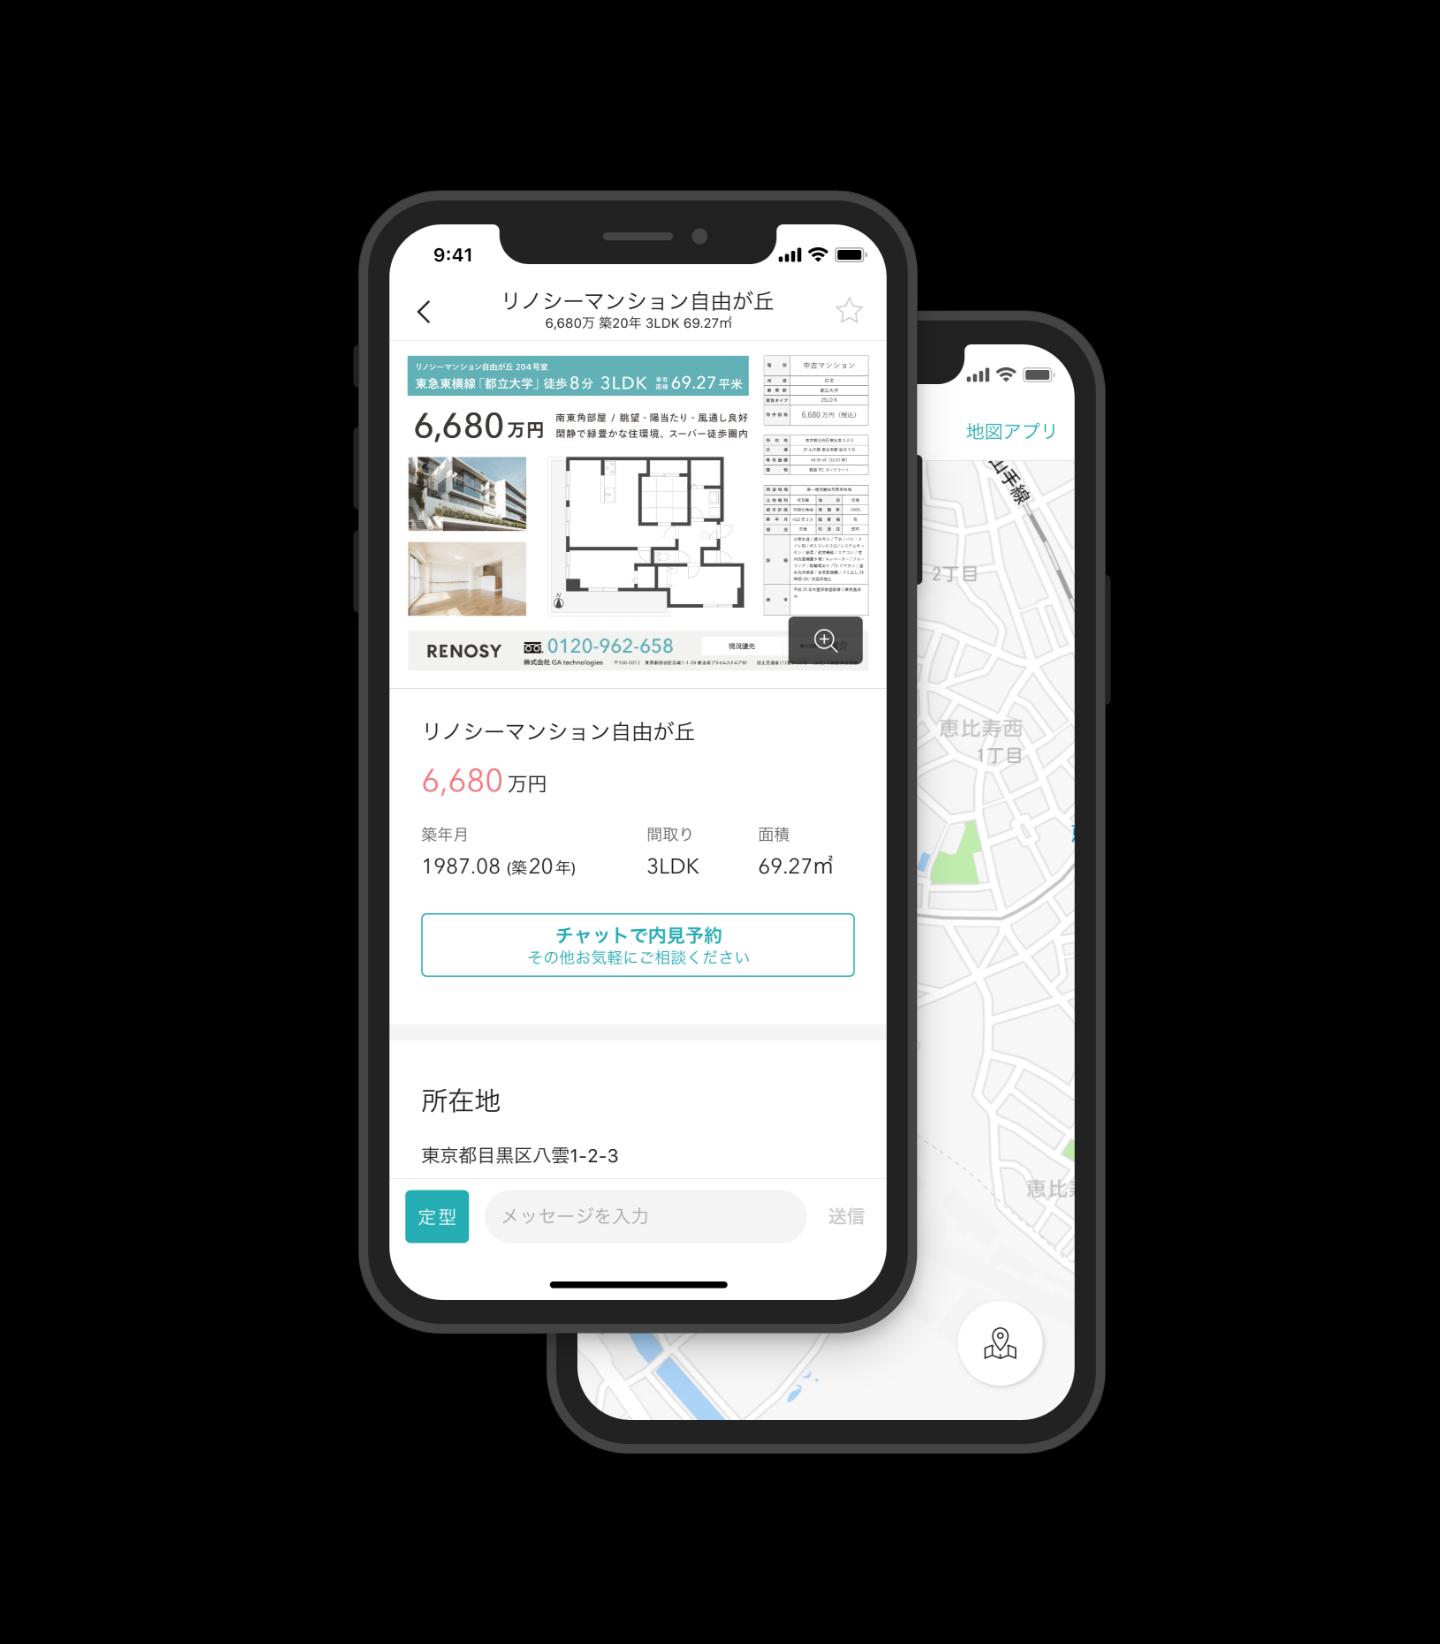 RENOSYアプリ 物件情報画面